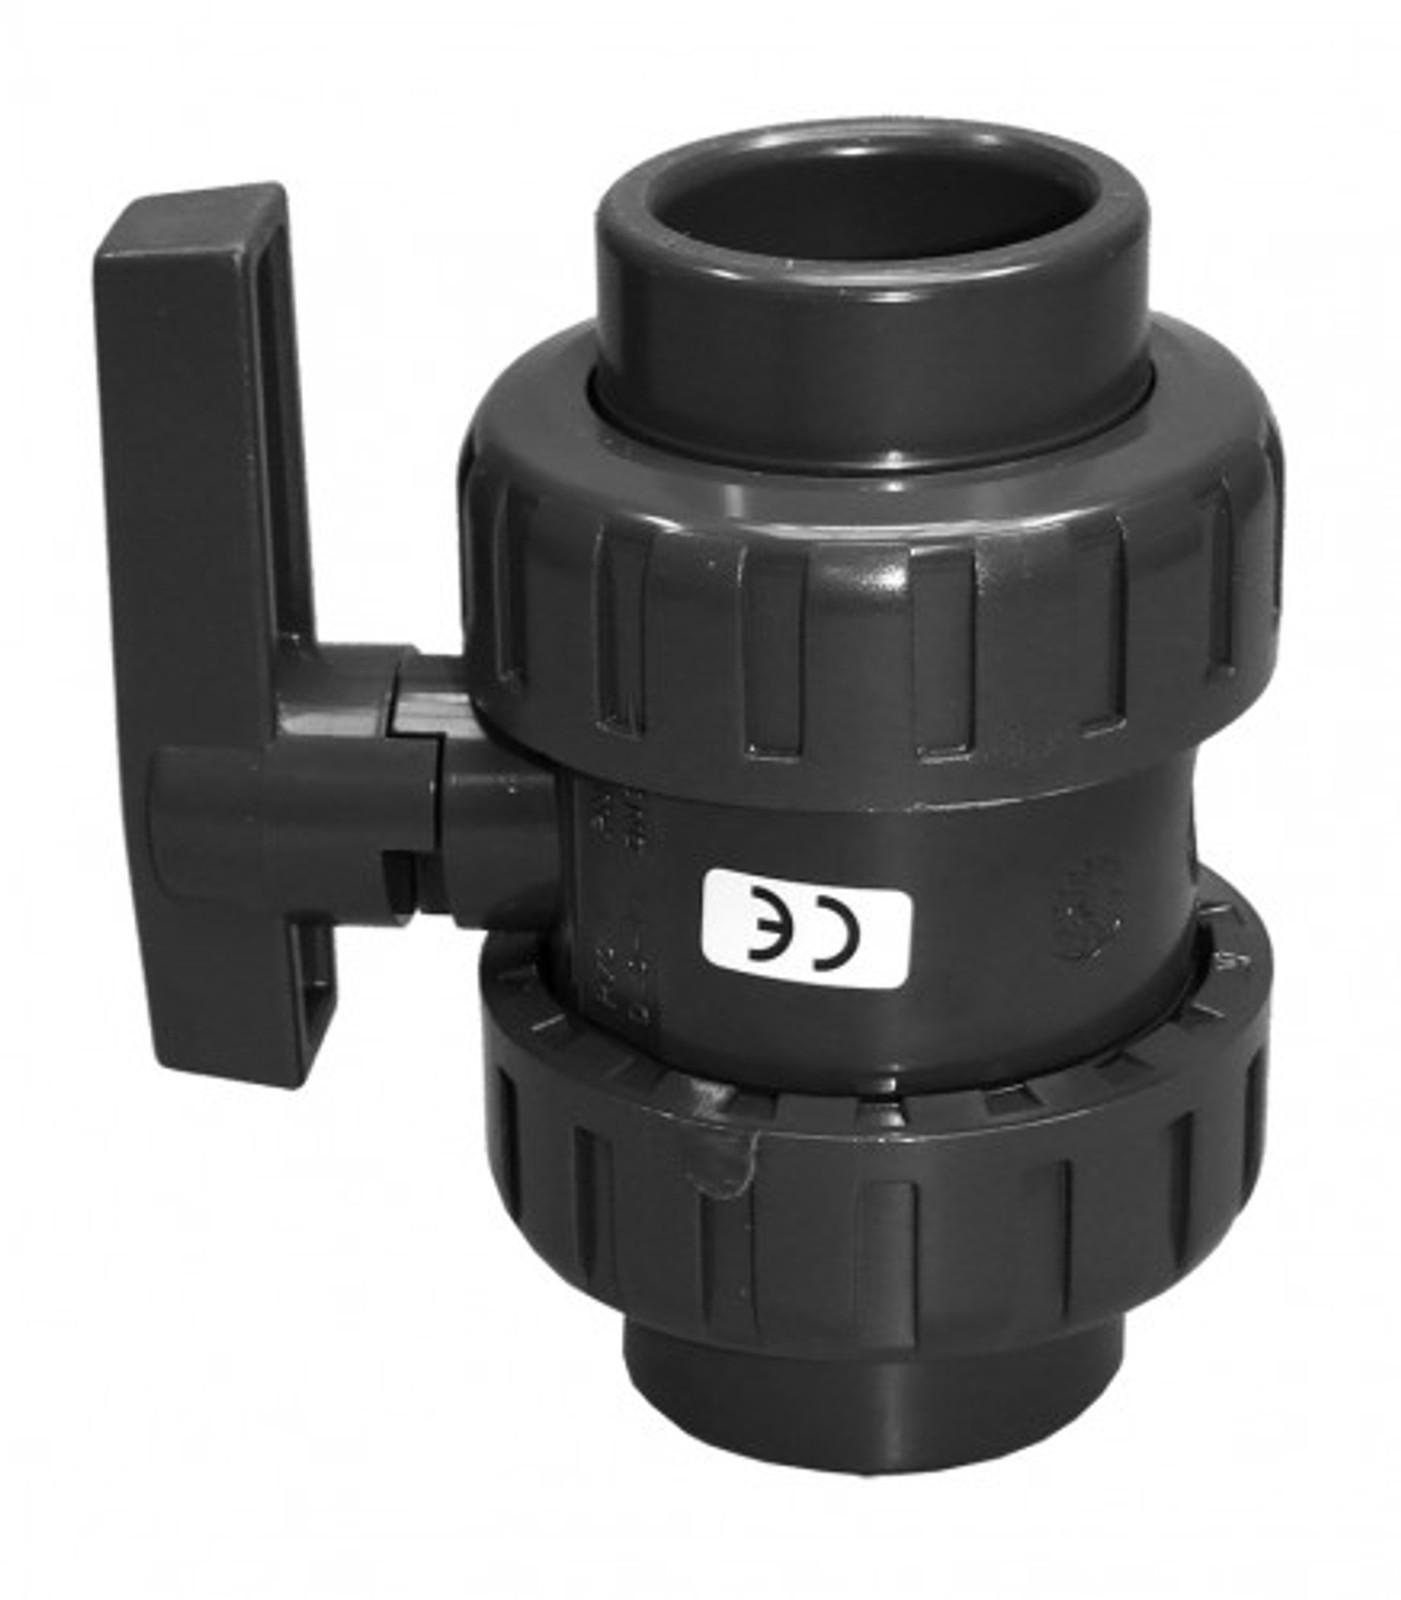 PVC-Kugelhahn m. 2 Anschlußenden, Ø 16 mm